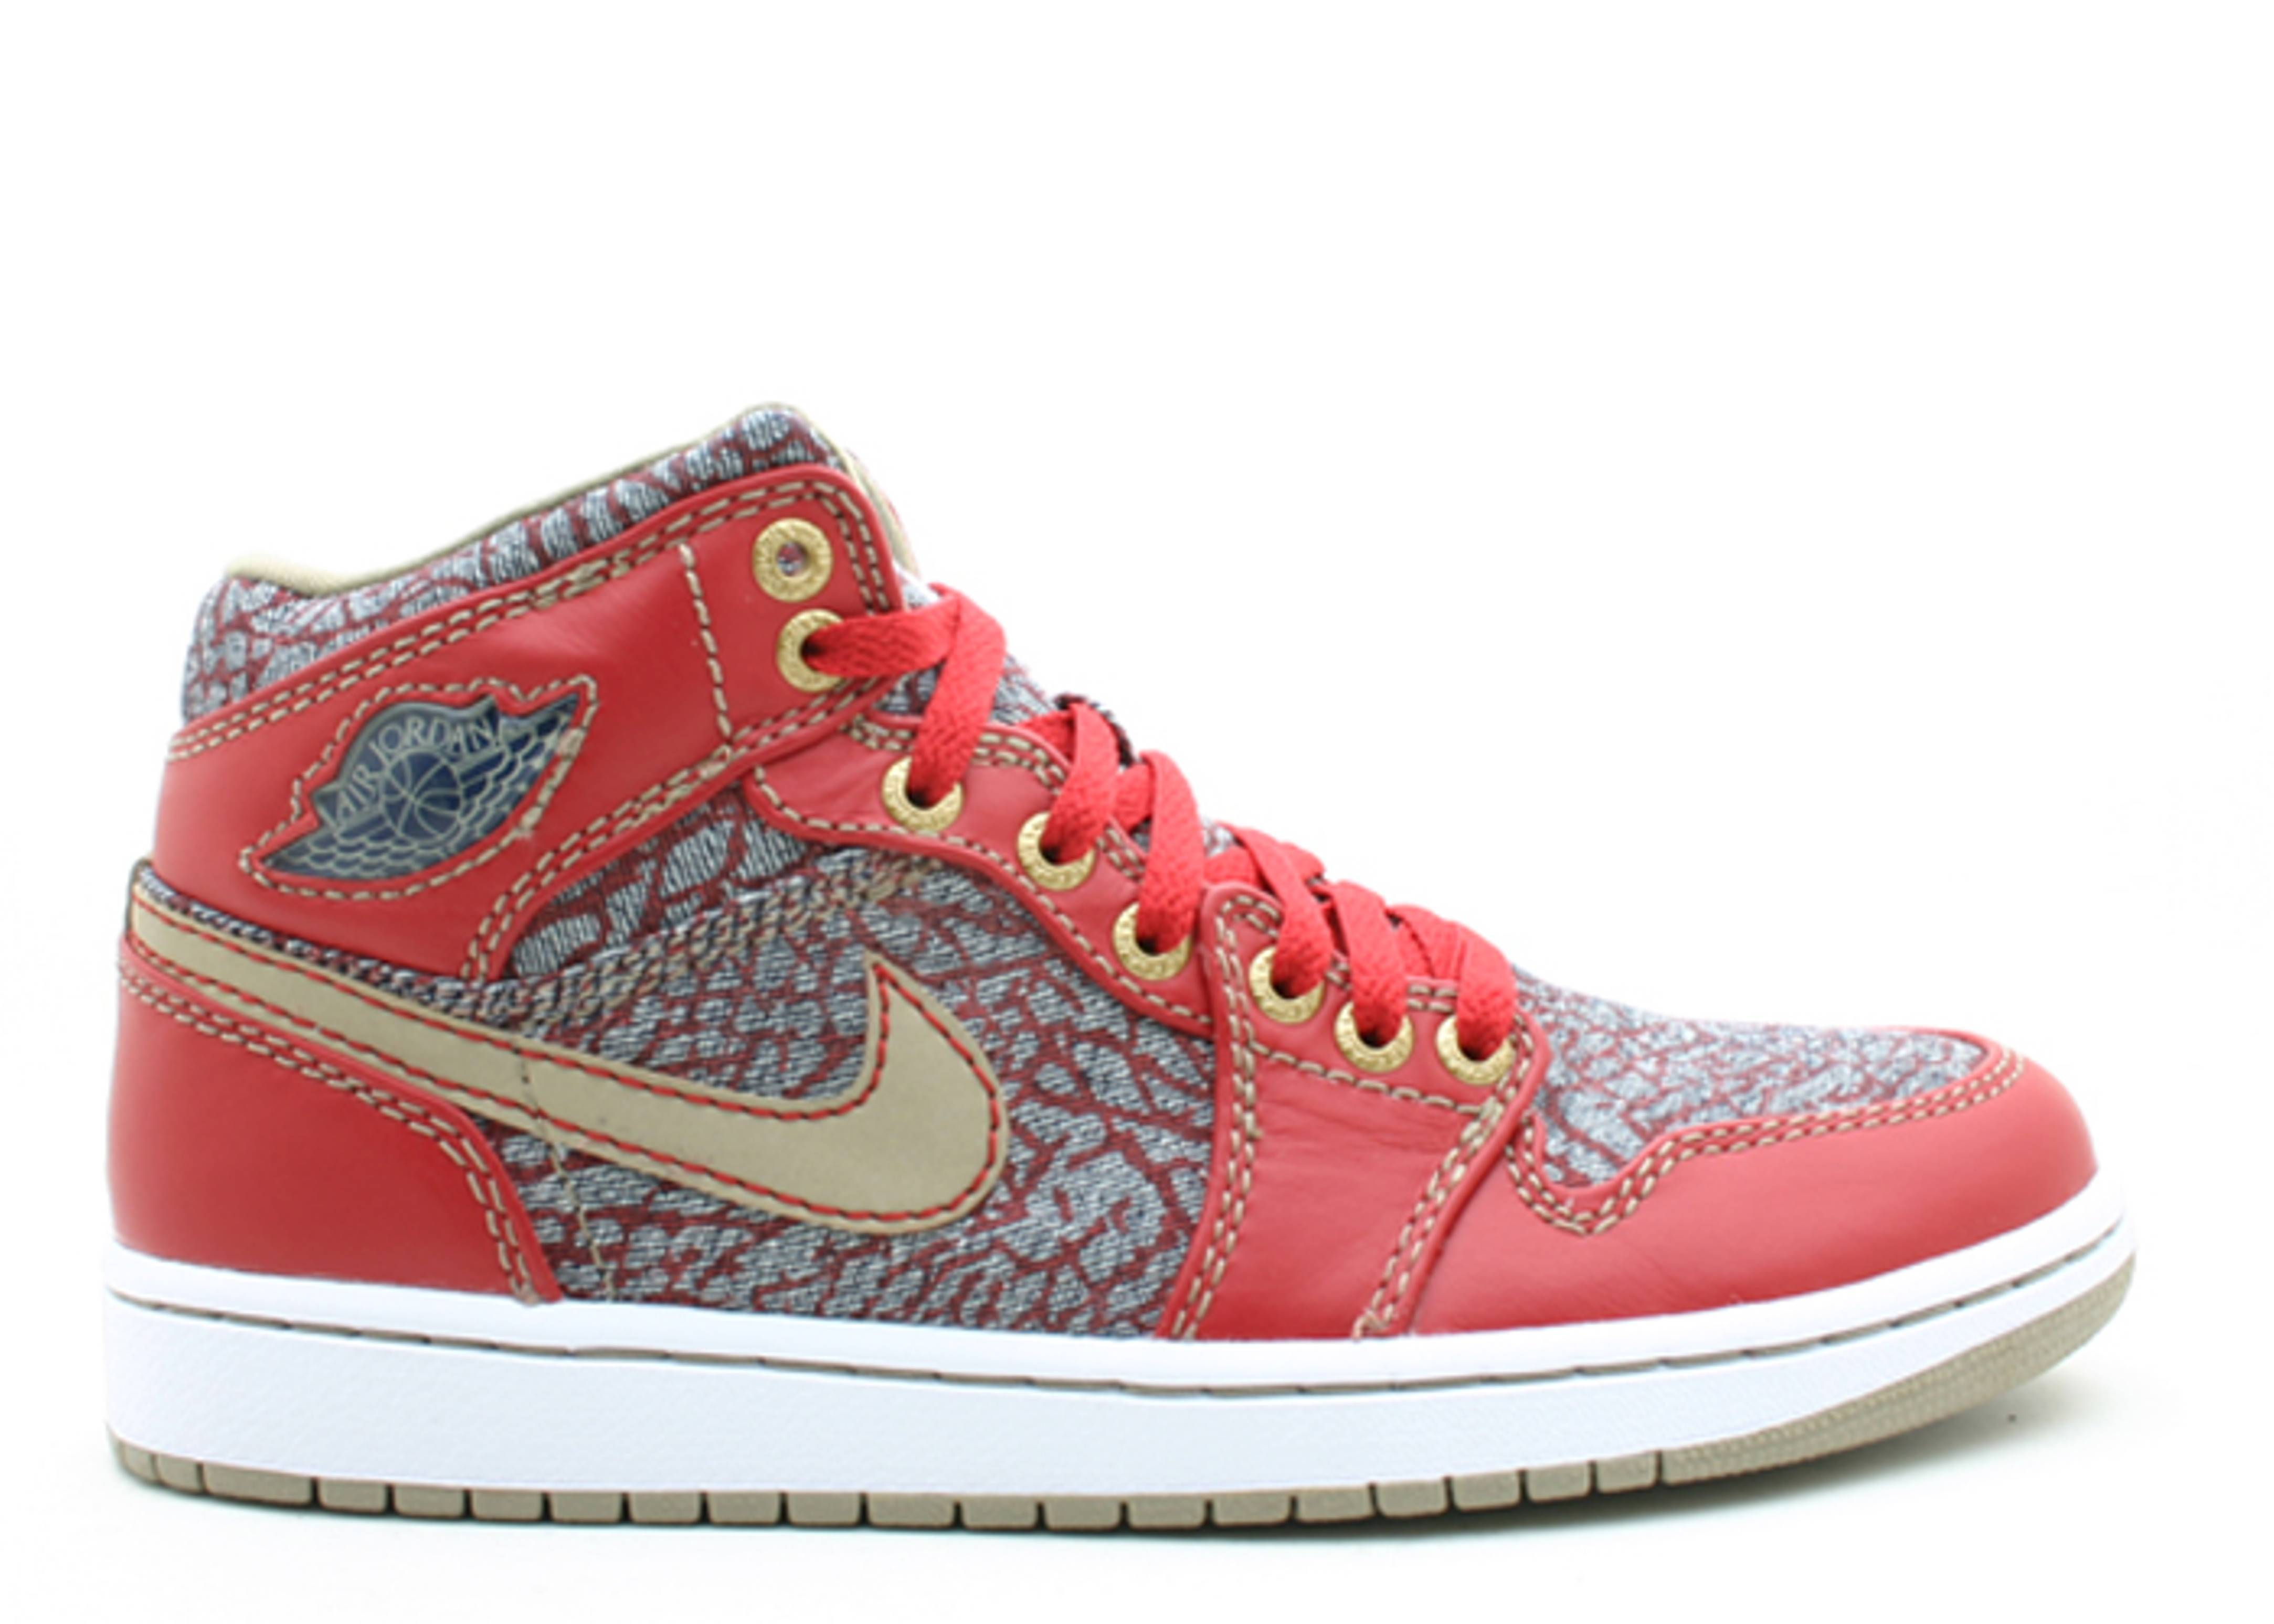 Nike Air Jordan Levi 1 Retro Denim - Varsity Red/Midnight Navy-Khaki-White